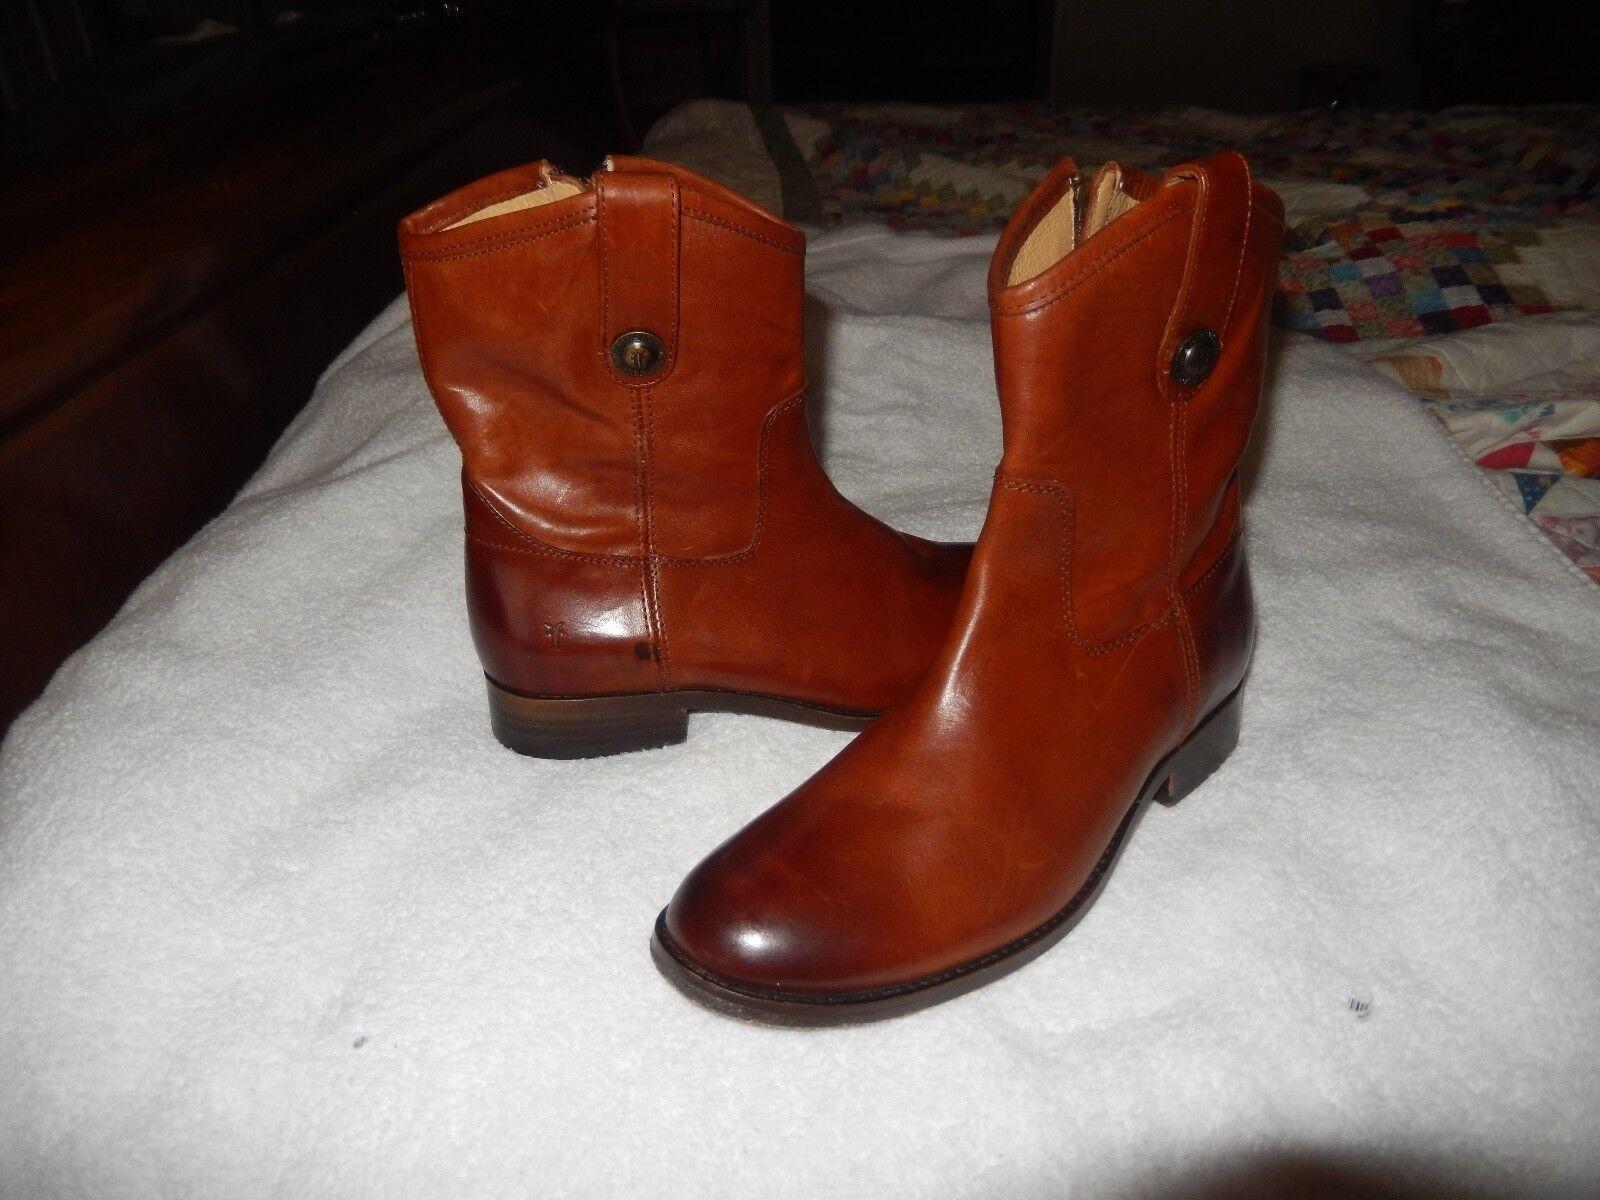 New Women's Frye Boots Melissa Button Short Cognac Riding Style 77897 6.5